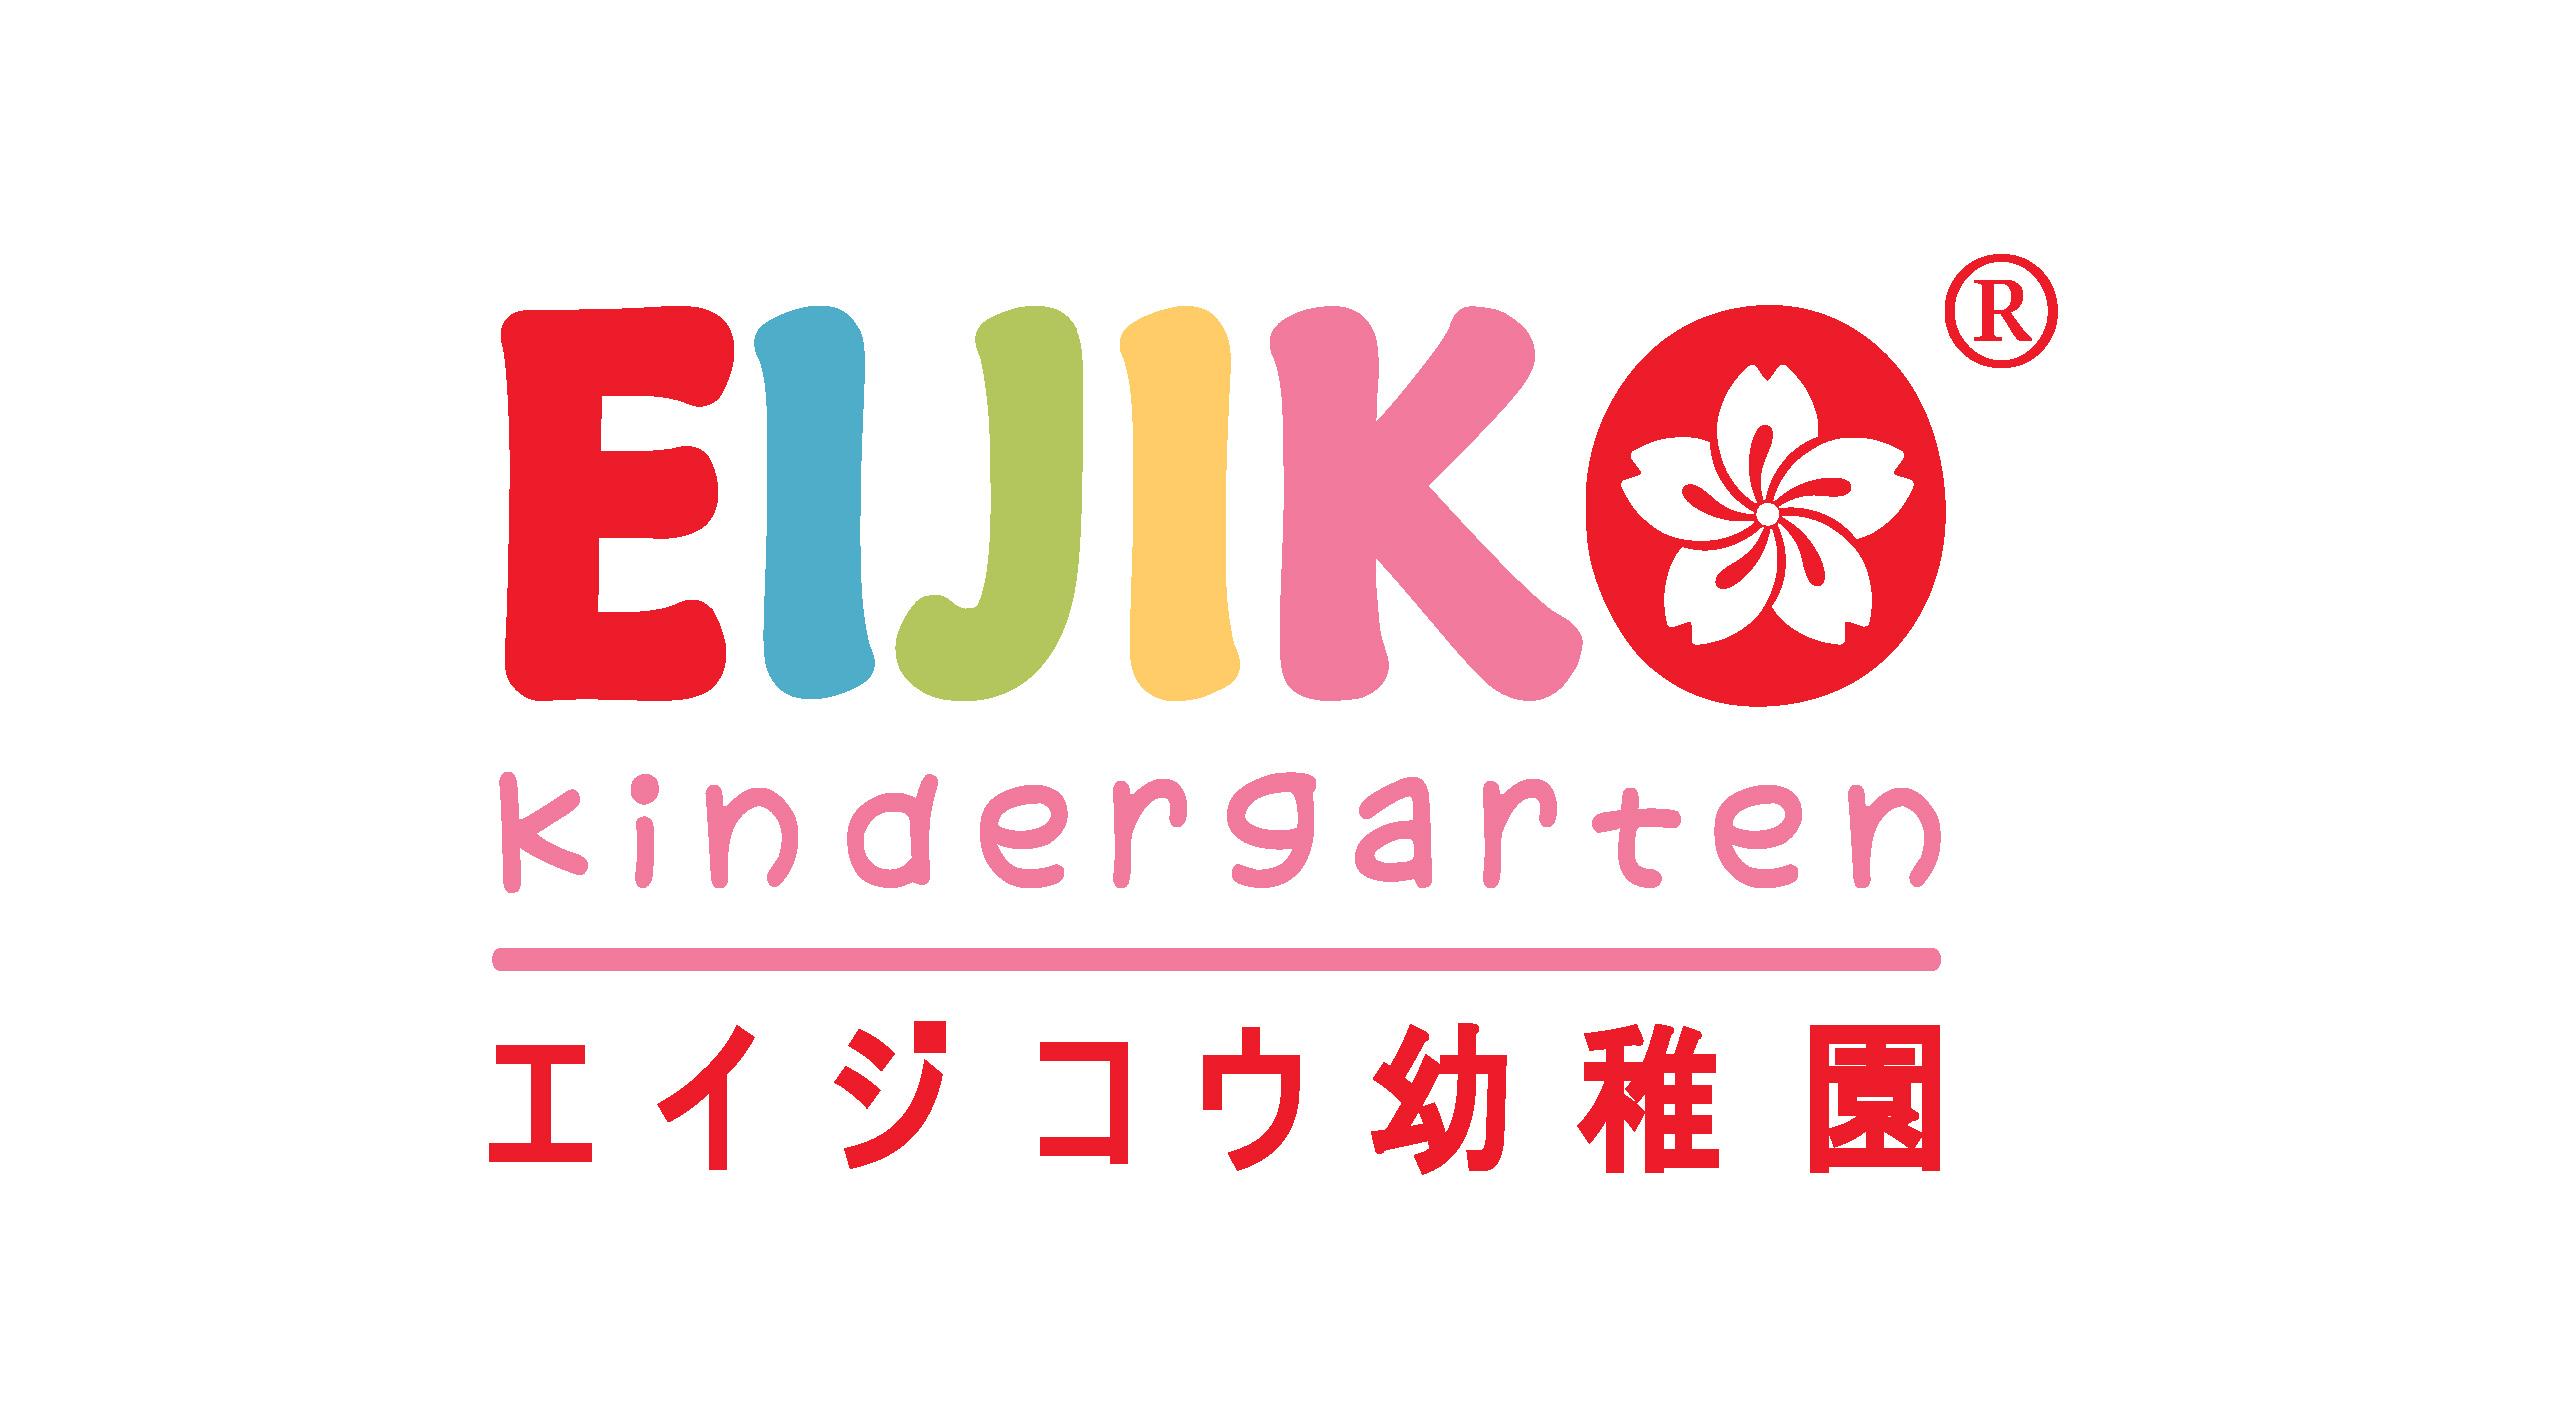 eijiko-kindergarten-mam-non-anh-nhi-hanh